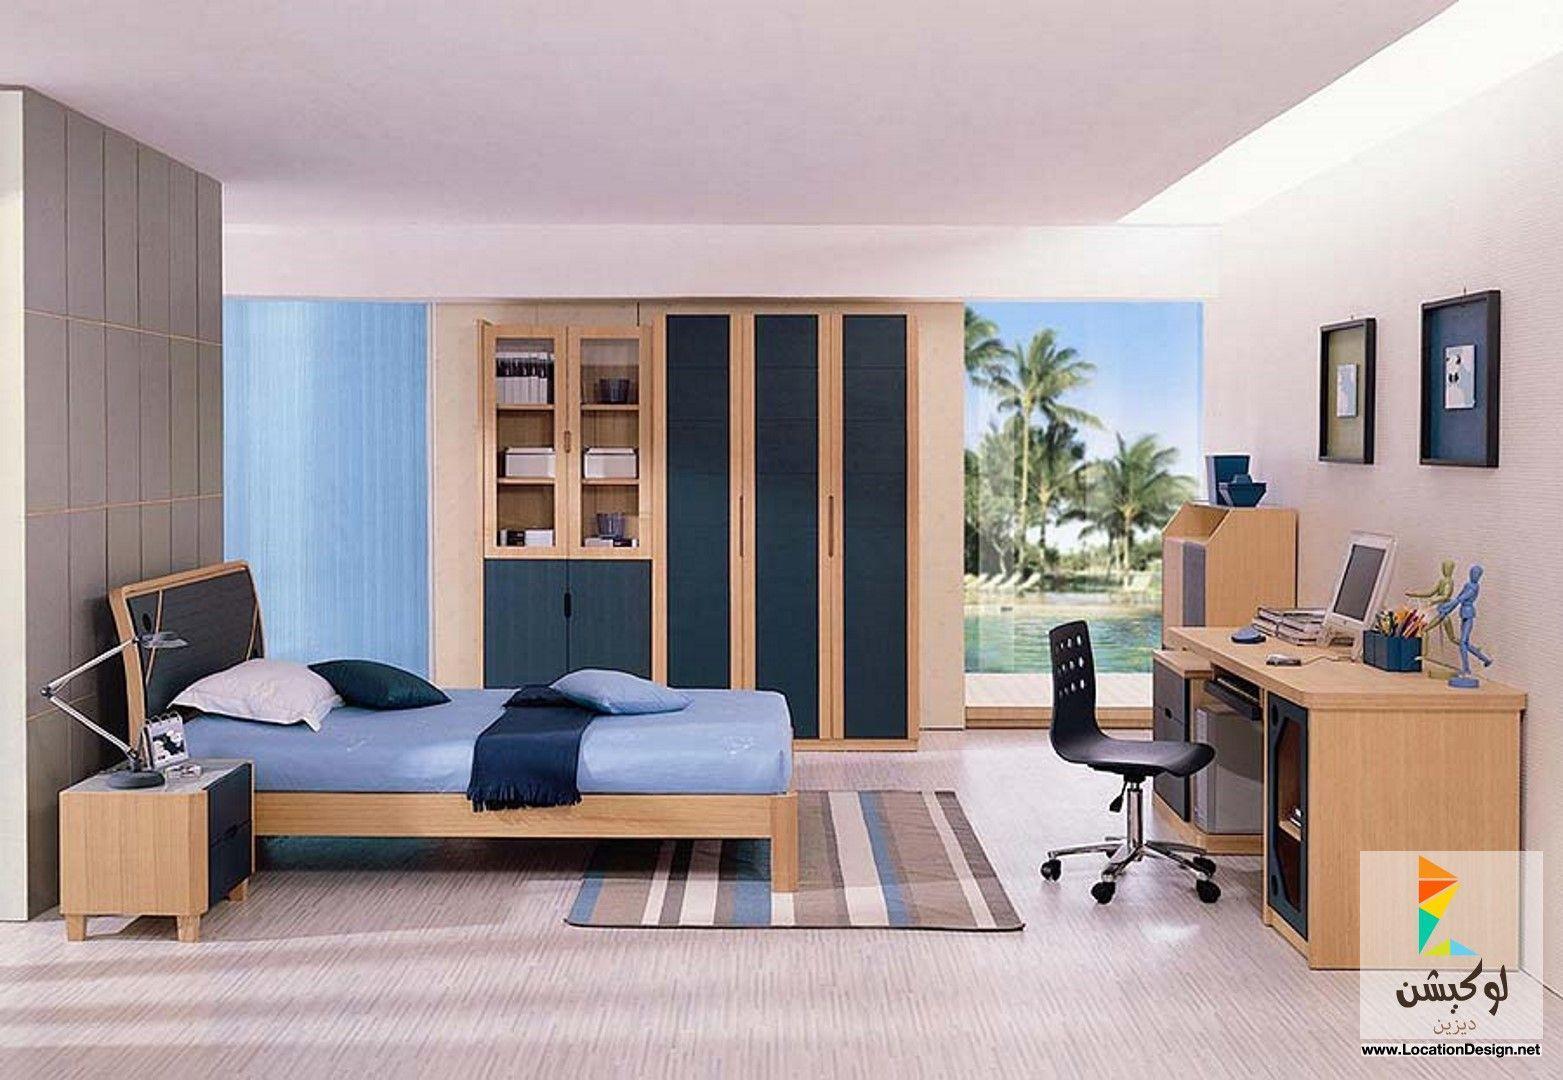 Kids Bedroom 2017 أحدث الوان غرف اطفال 2017 - 2018 بتصميمات مودرن - لوكشين ديزين